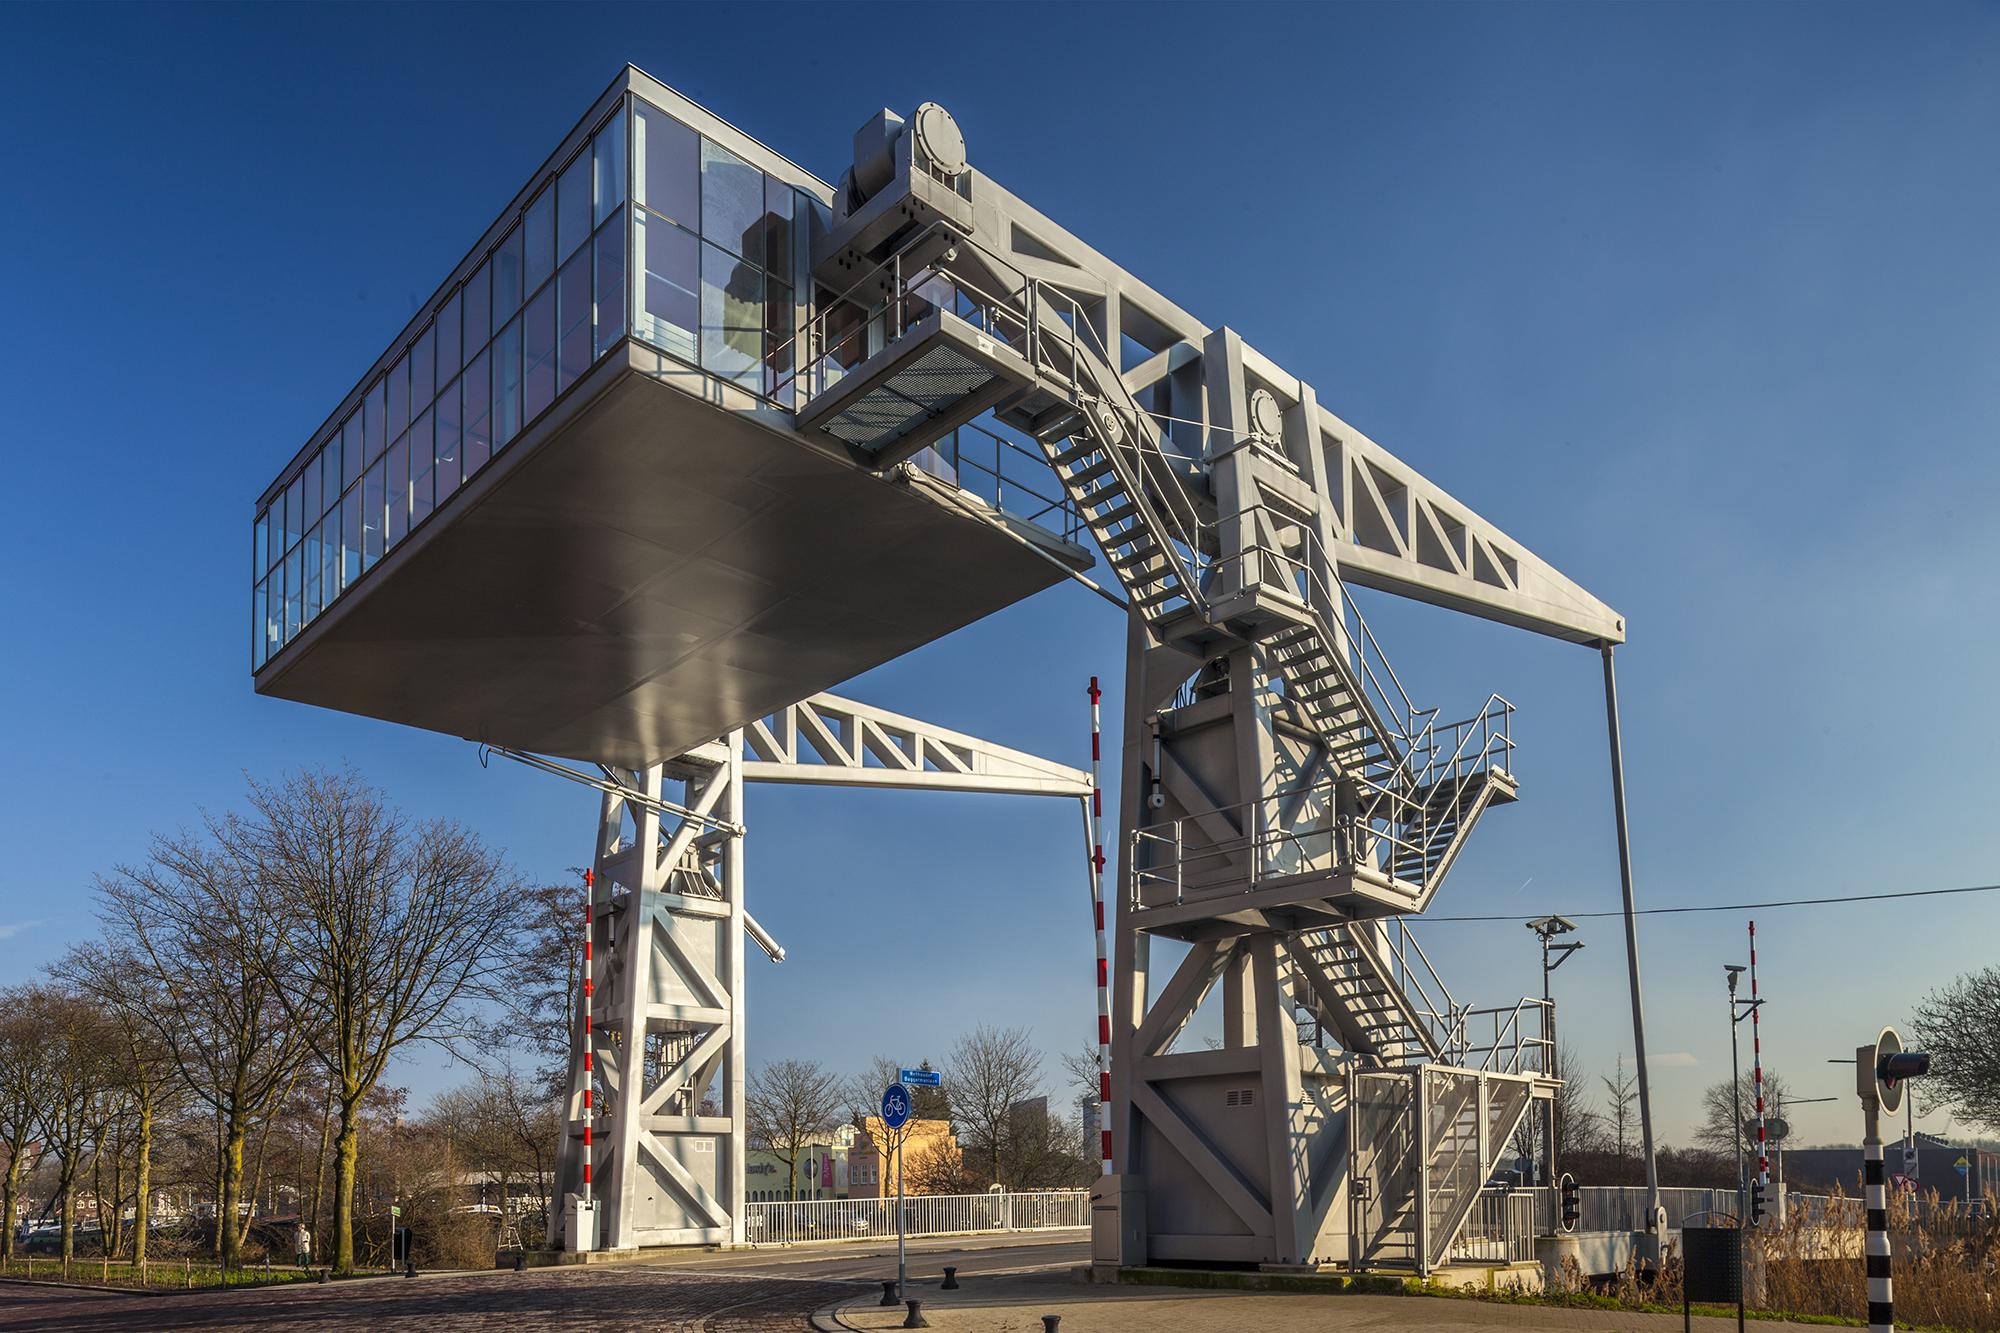 Brug over de Piushaven in Tilburg. Ontwerp: John Körmeling.